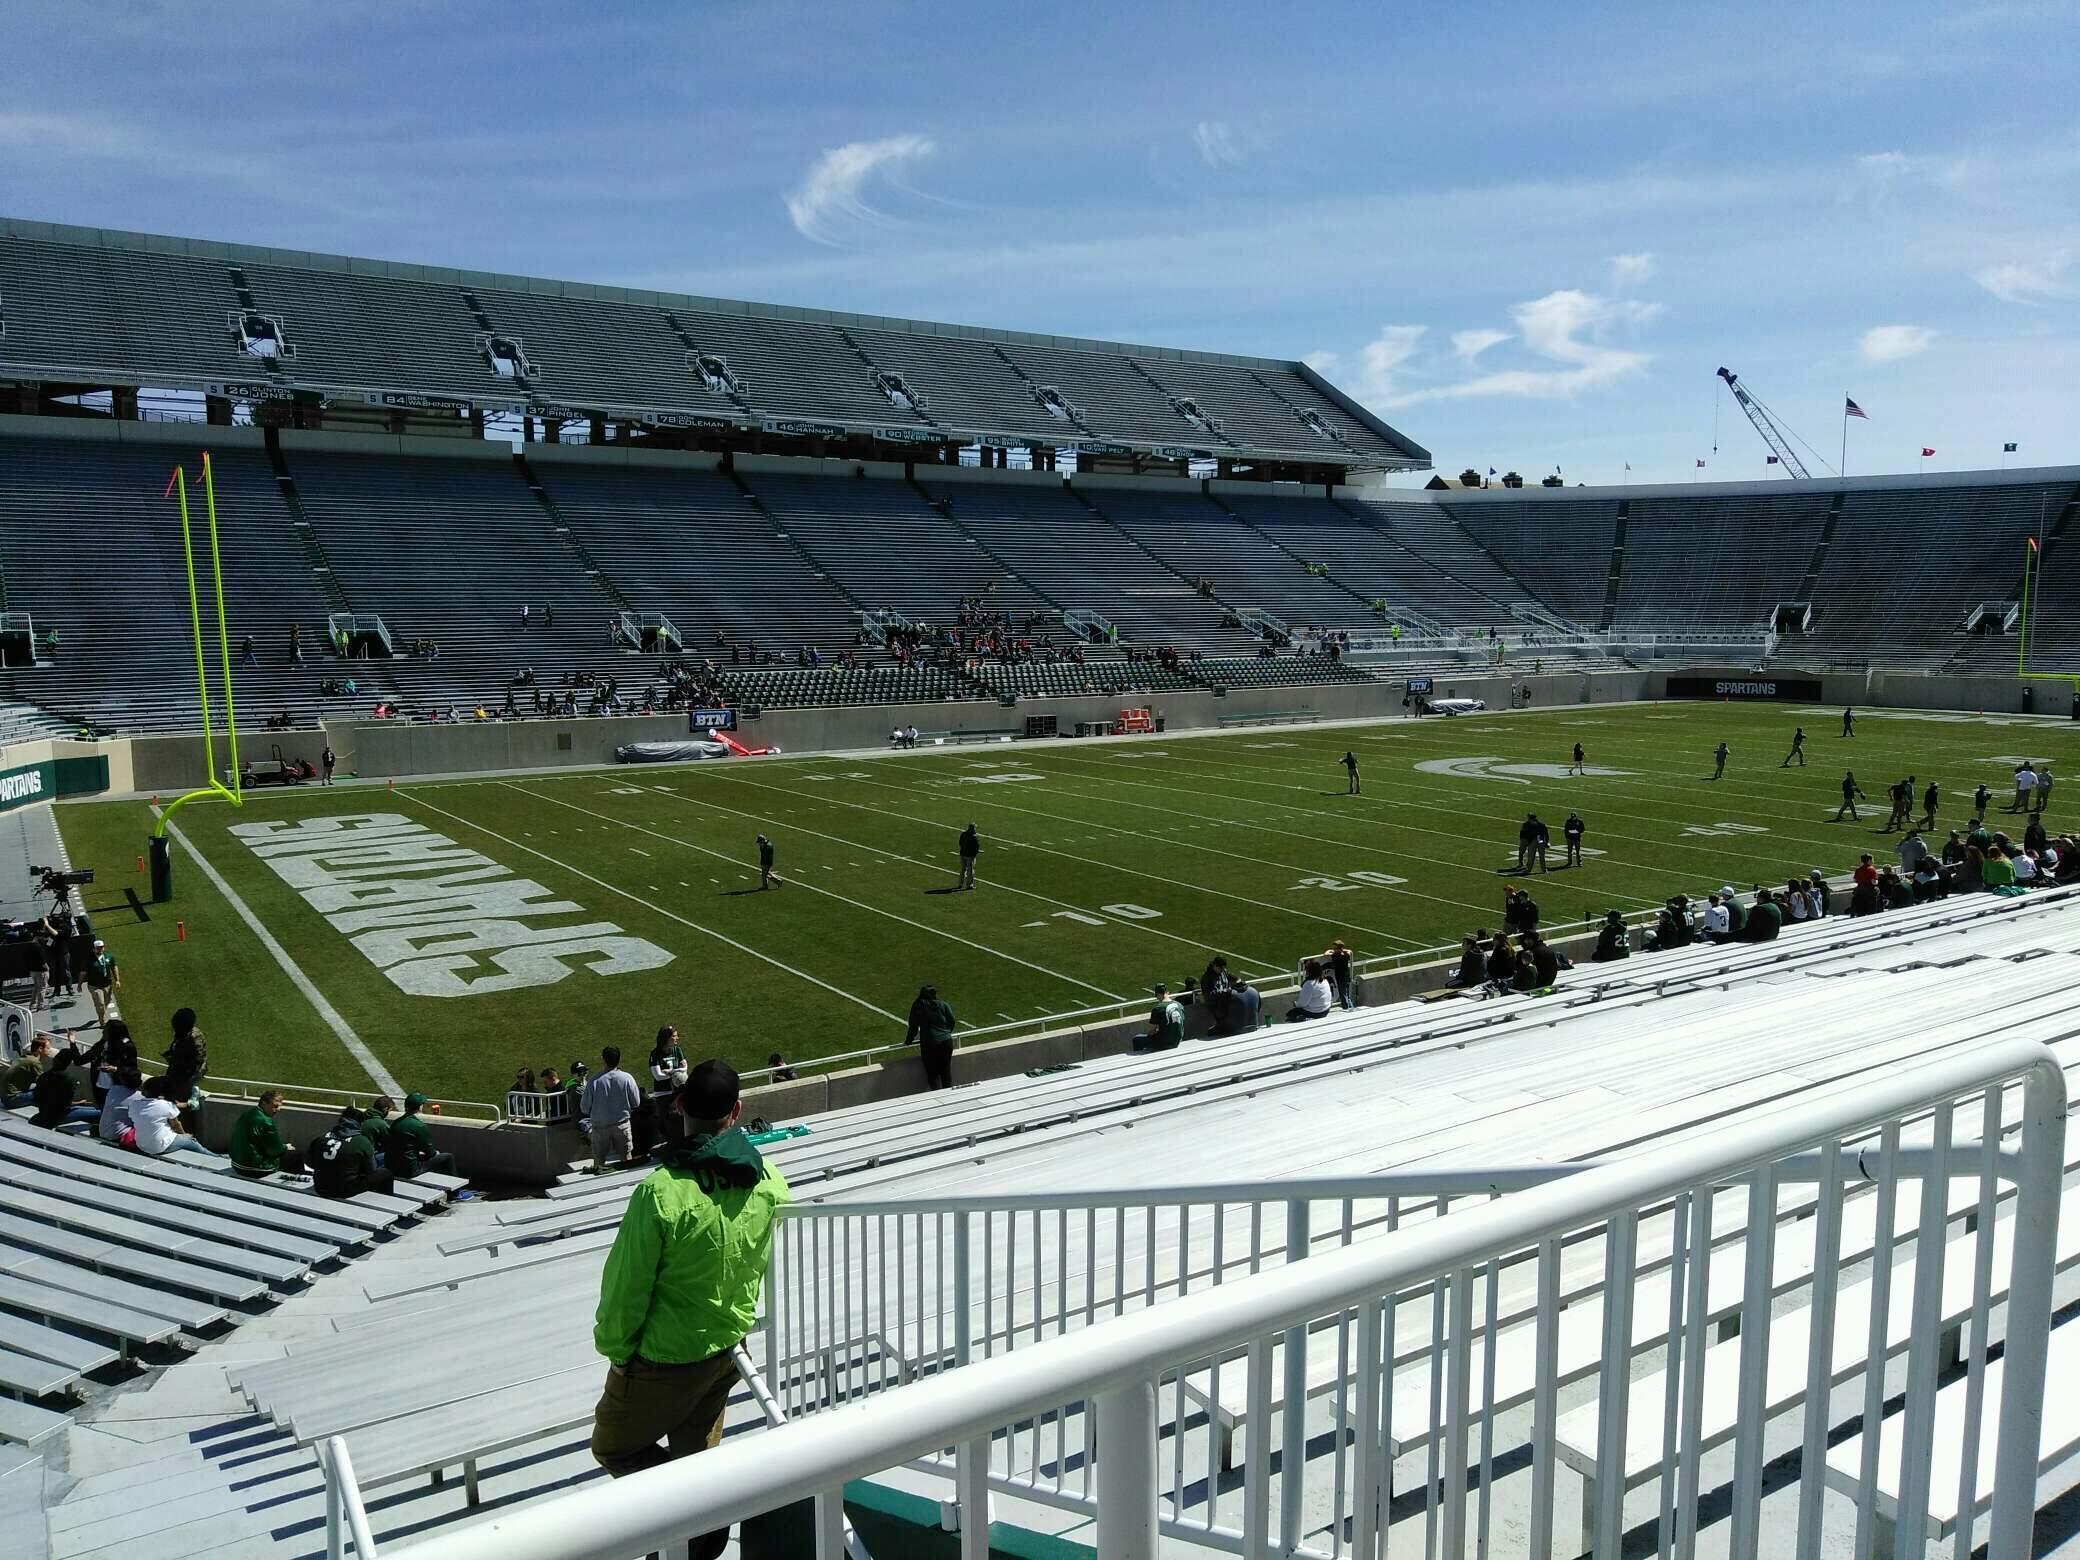 Spartan Stadium Section 28 Row 28 Seat 21